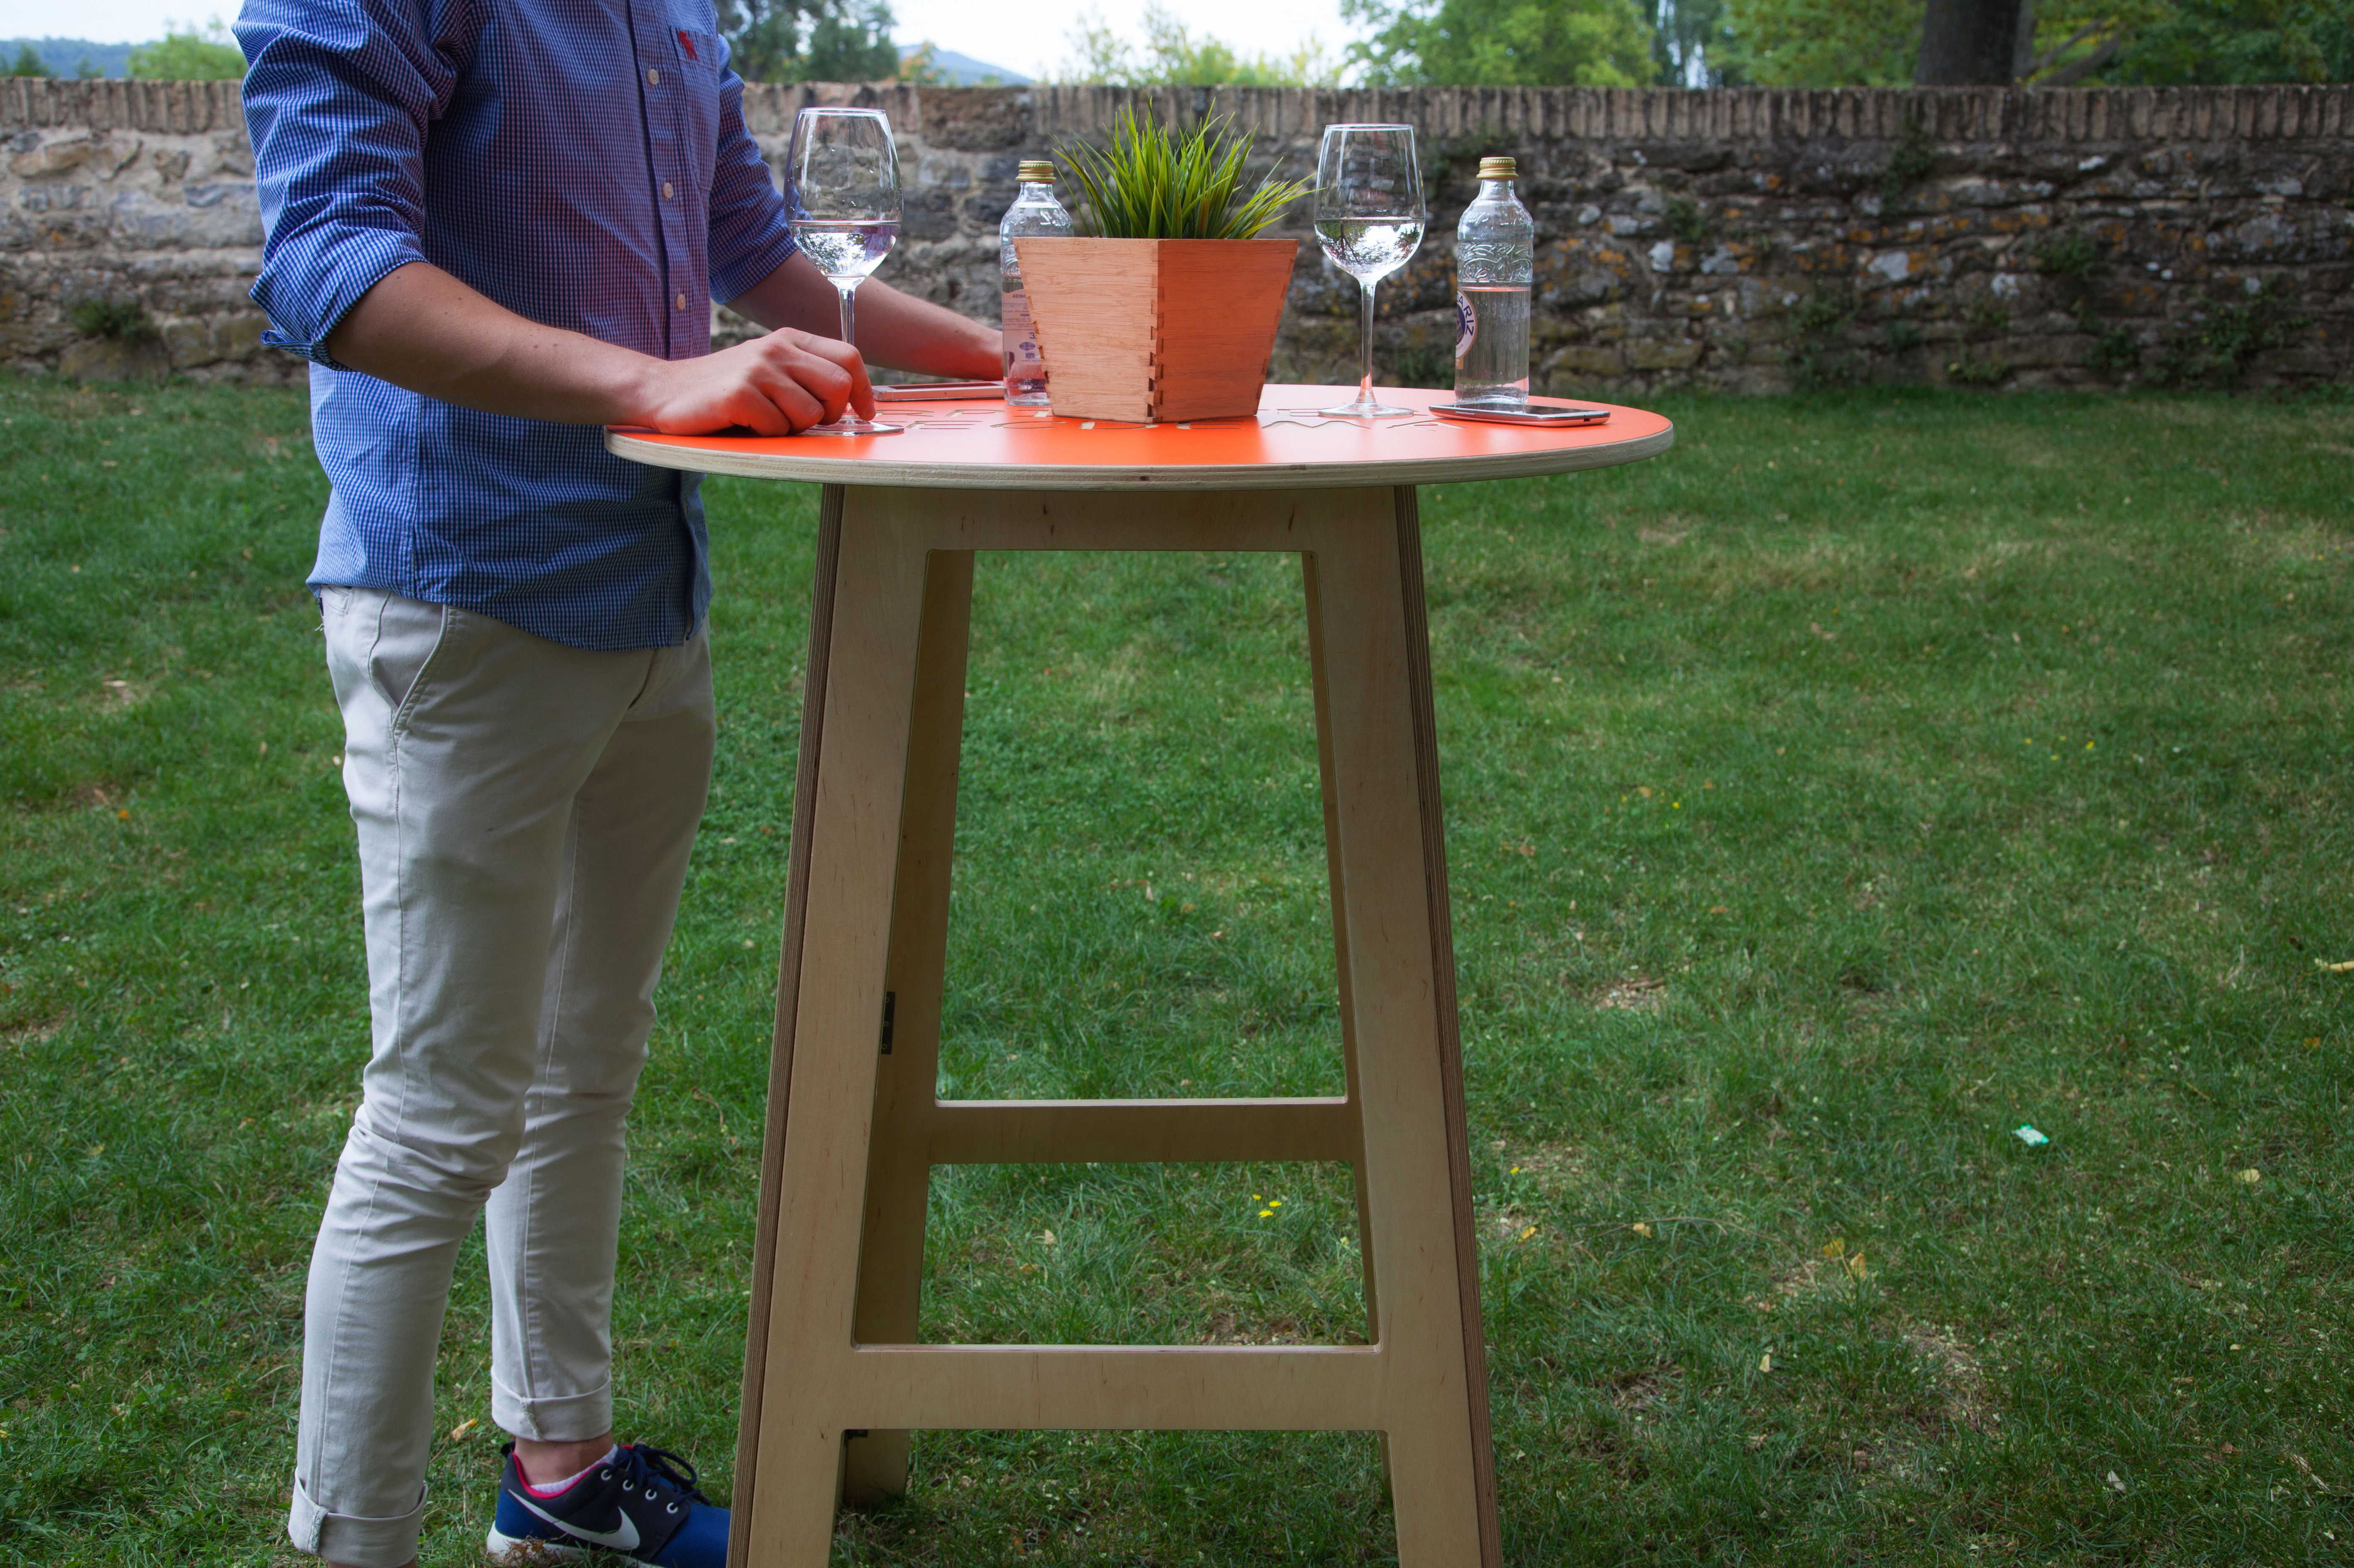 Plegable Hosteler A Ideal Para Terrazas Productos De Tecdema S L  # Muebles Tajonar